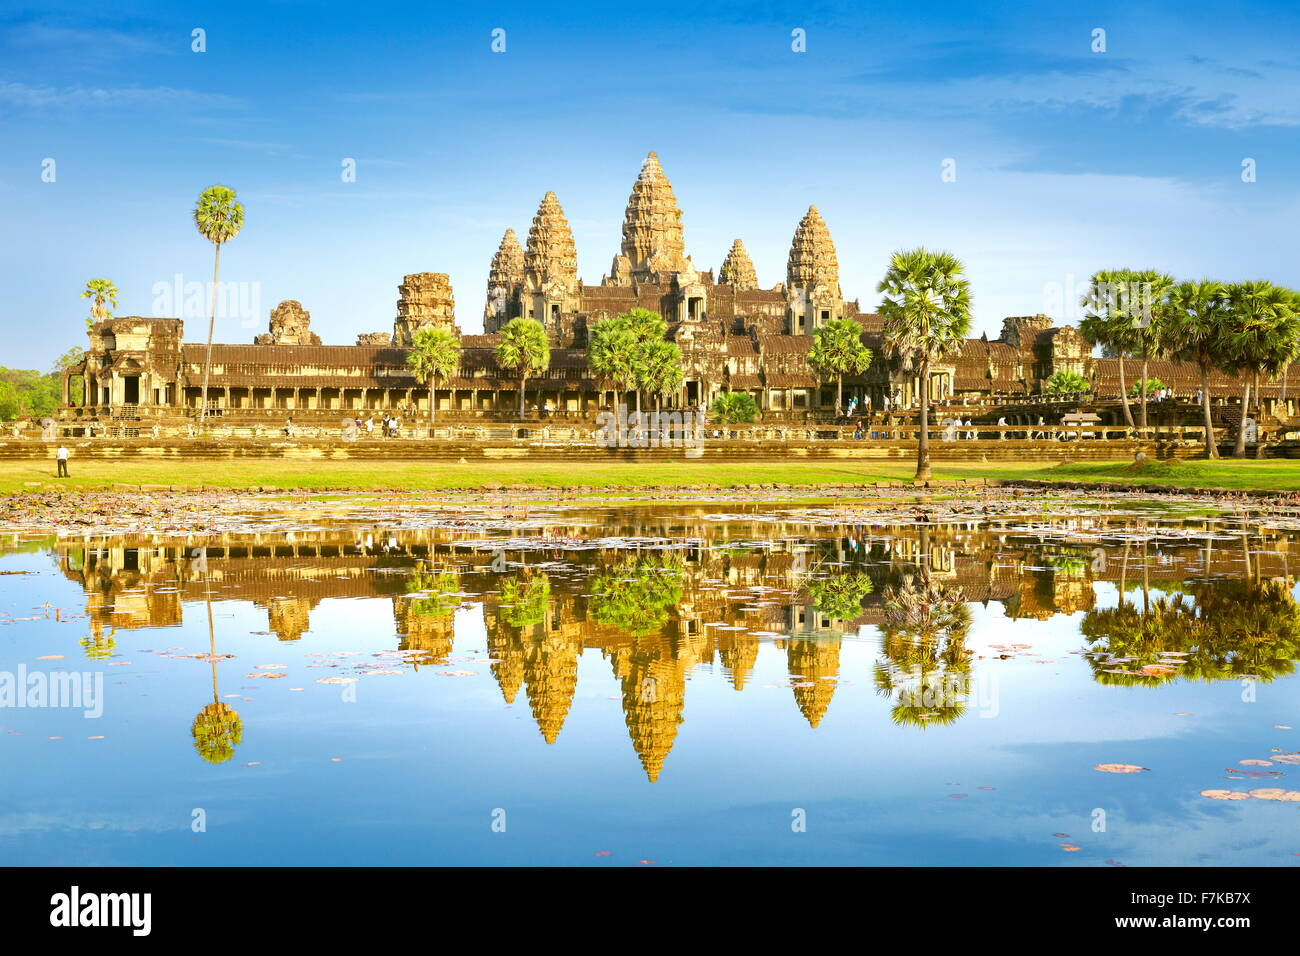 Angkor Wat Temple, Cambodia, Asia (UNESCO) Stock Photo